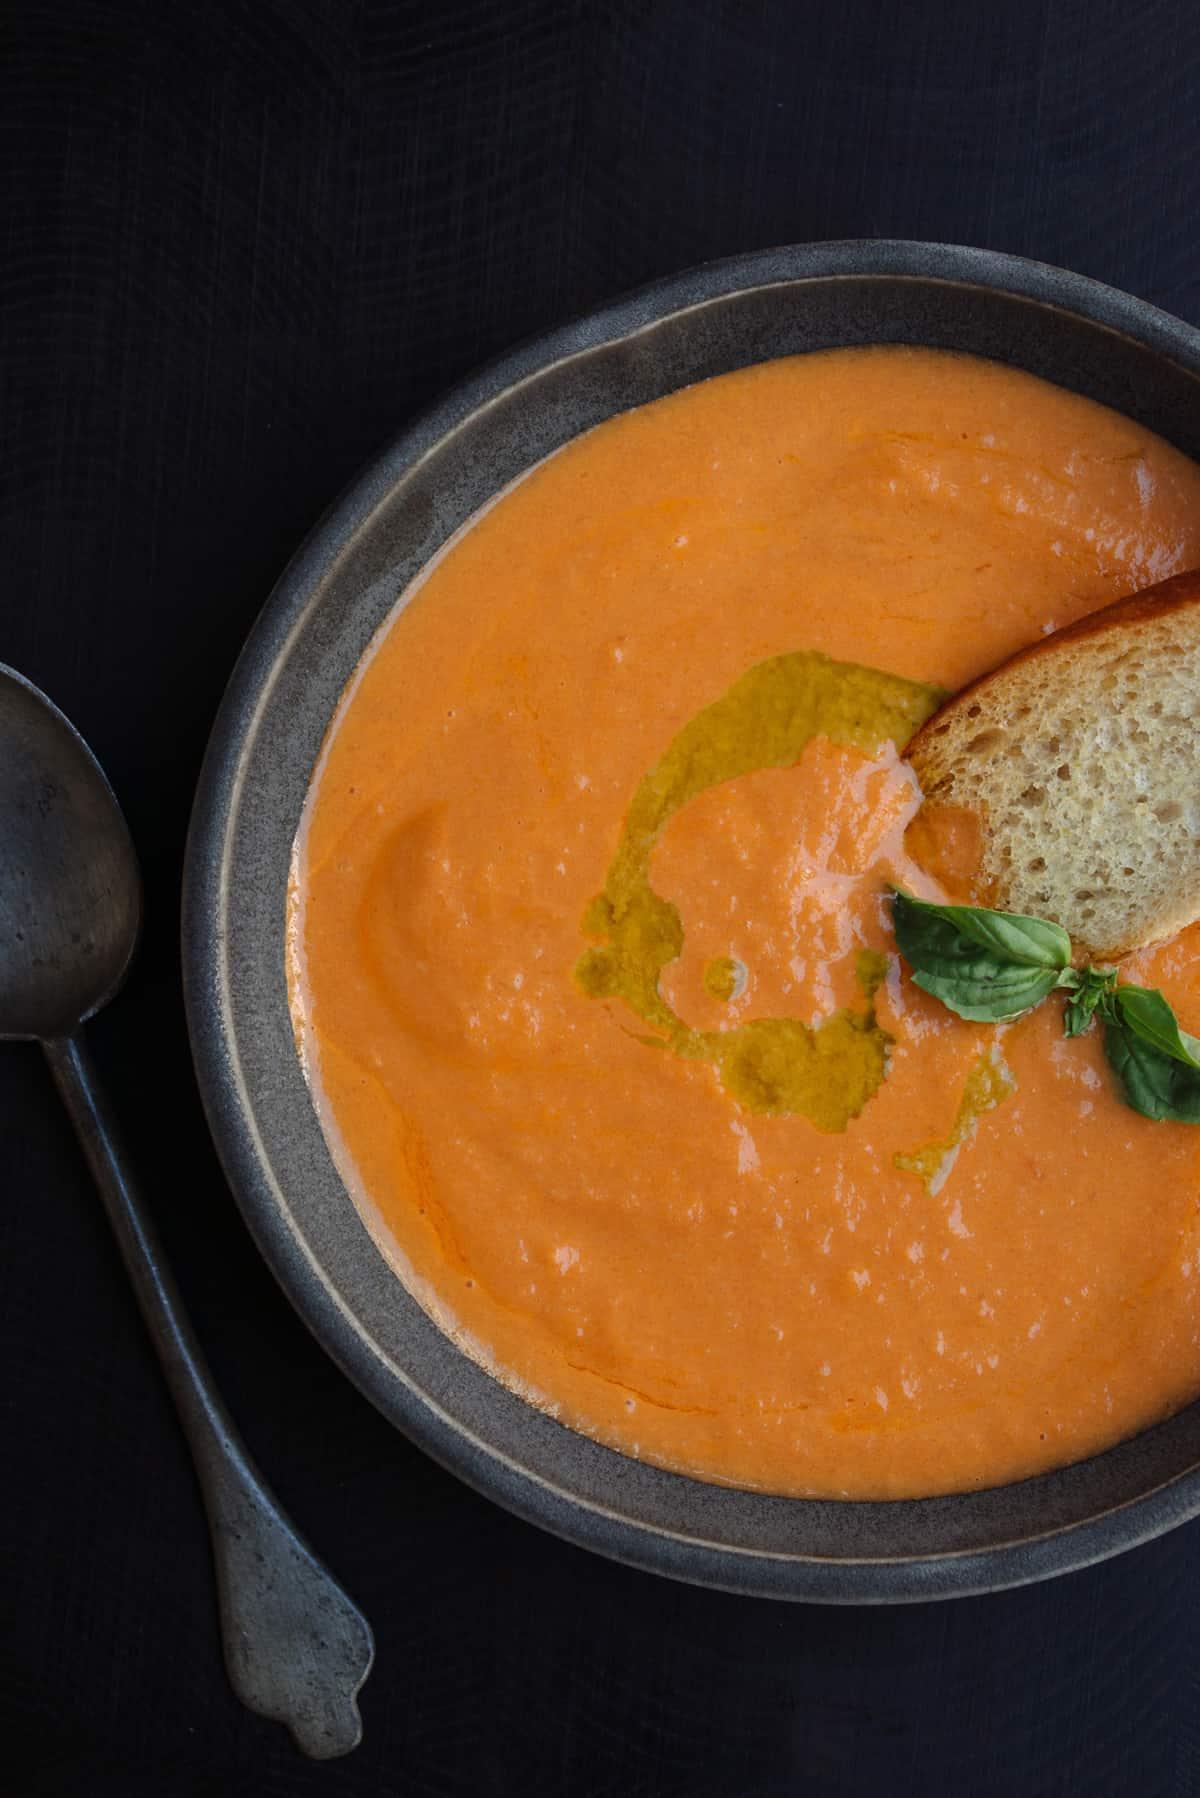 Tomato Soup Recipe by Tiffani Thiessen